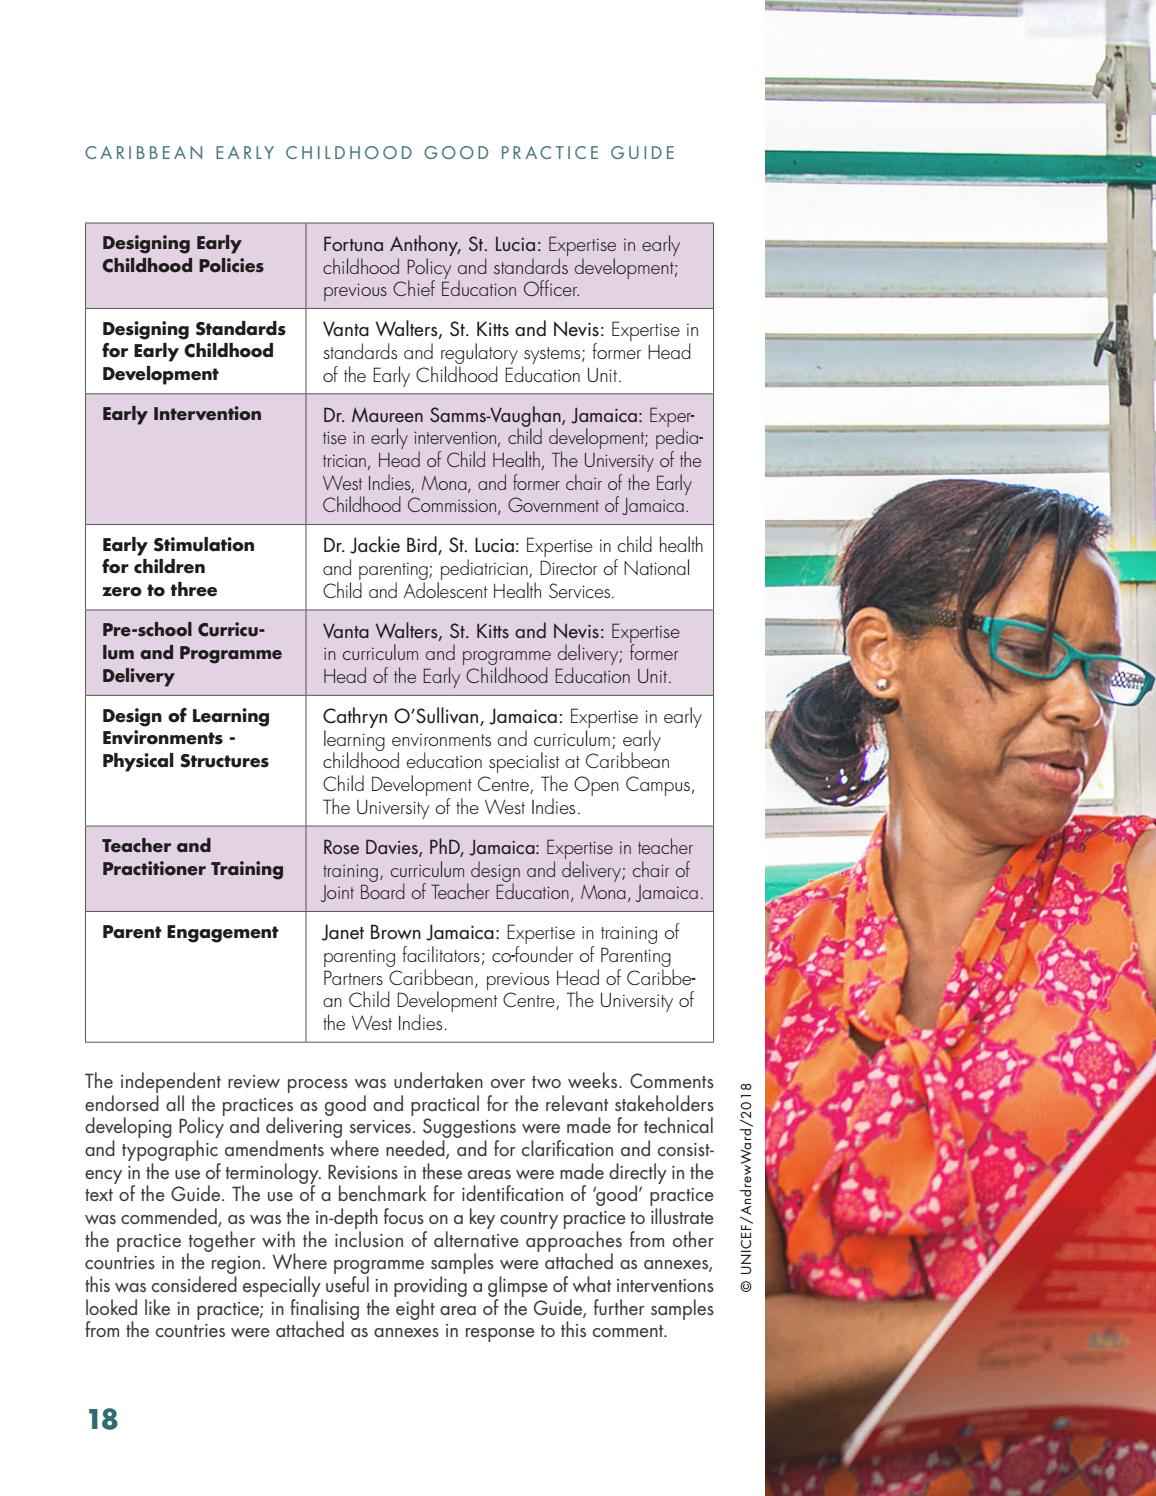 Caribbean Early Childhood Development Good Practice Guide By Caribbean Development Bank Issuu